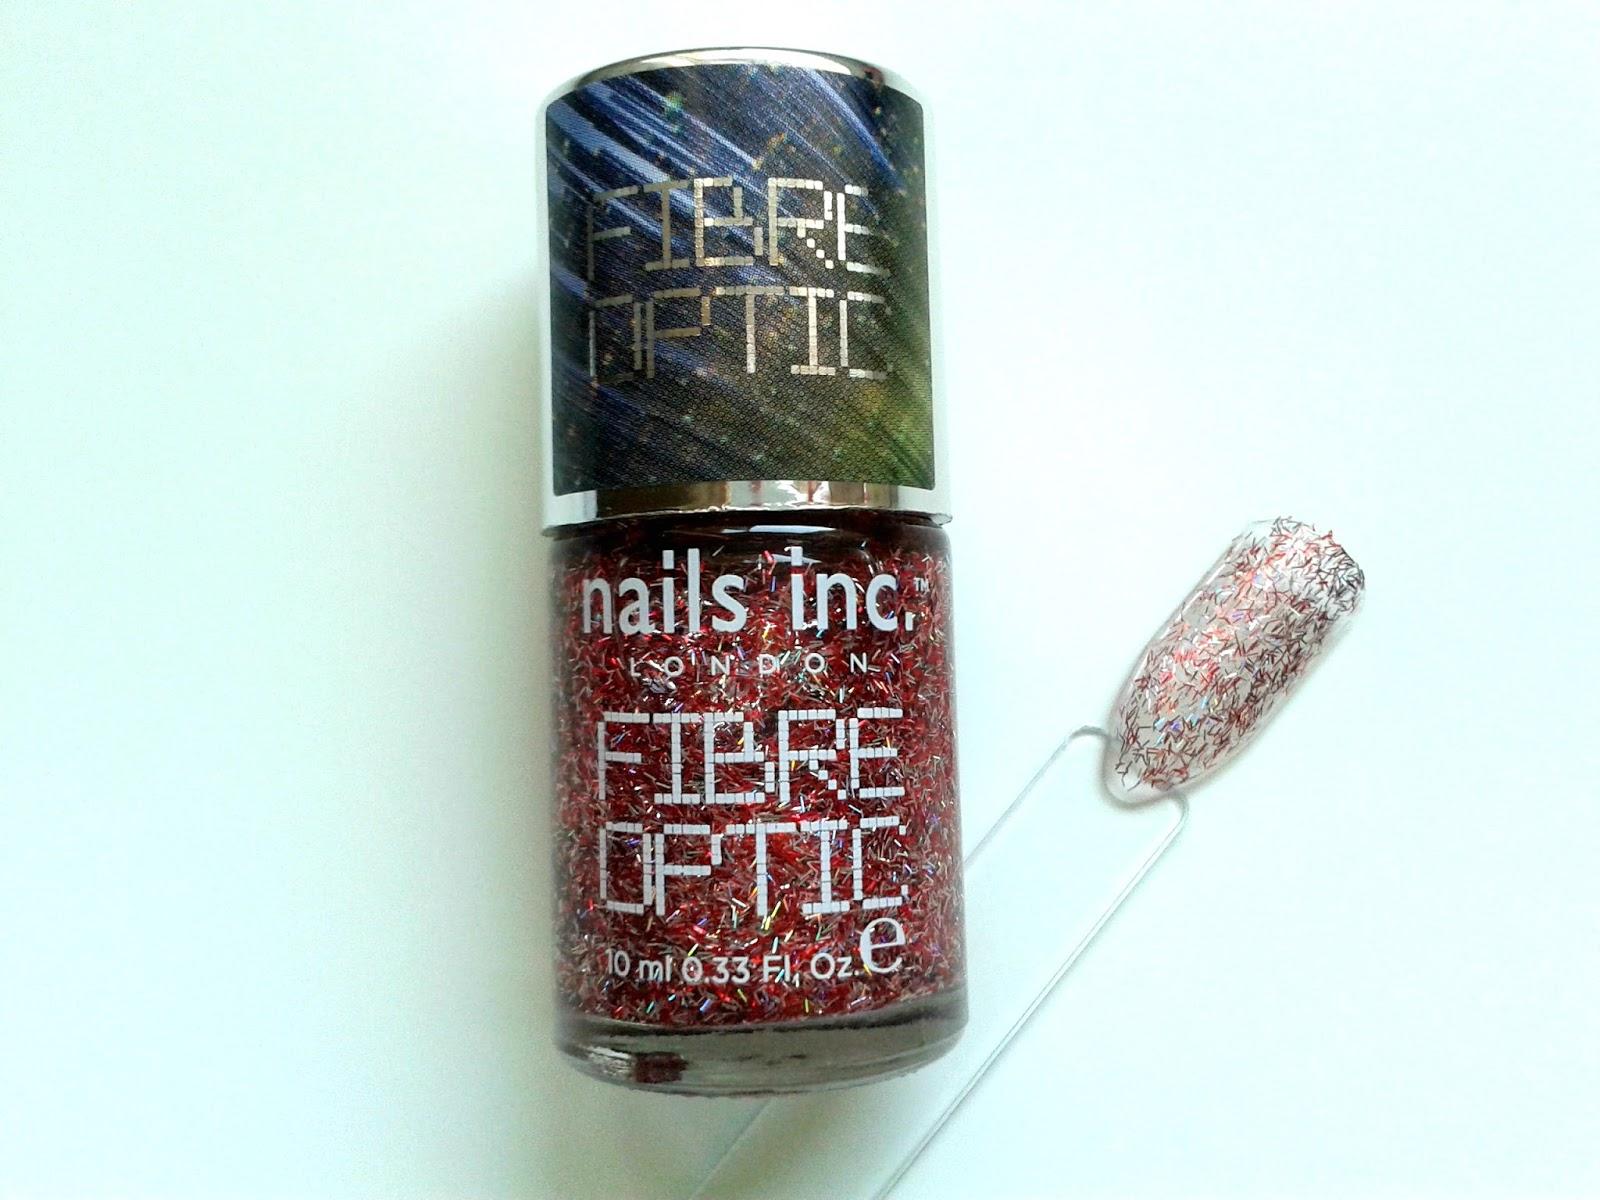 Nails Inc Nail Polish Diary: October Beauty Review Belgravia Place Fibre Optic Polish